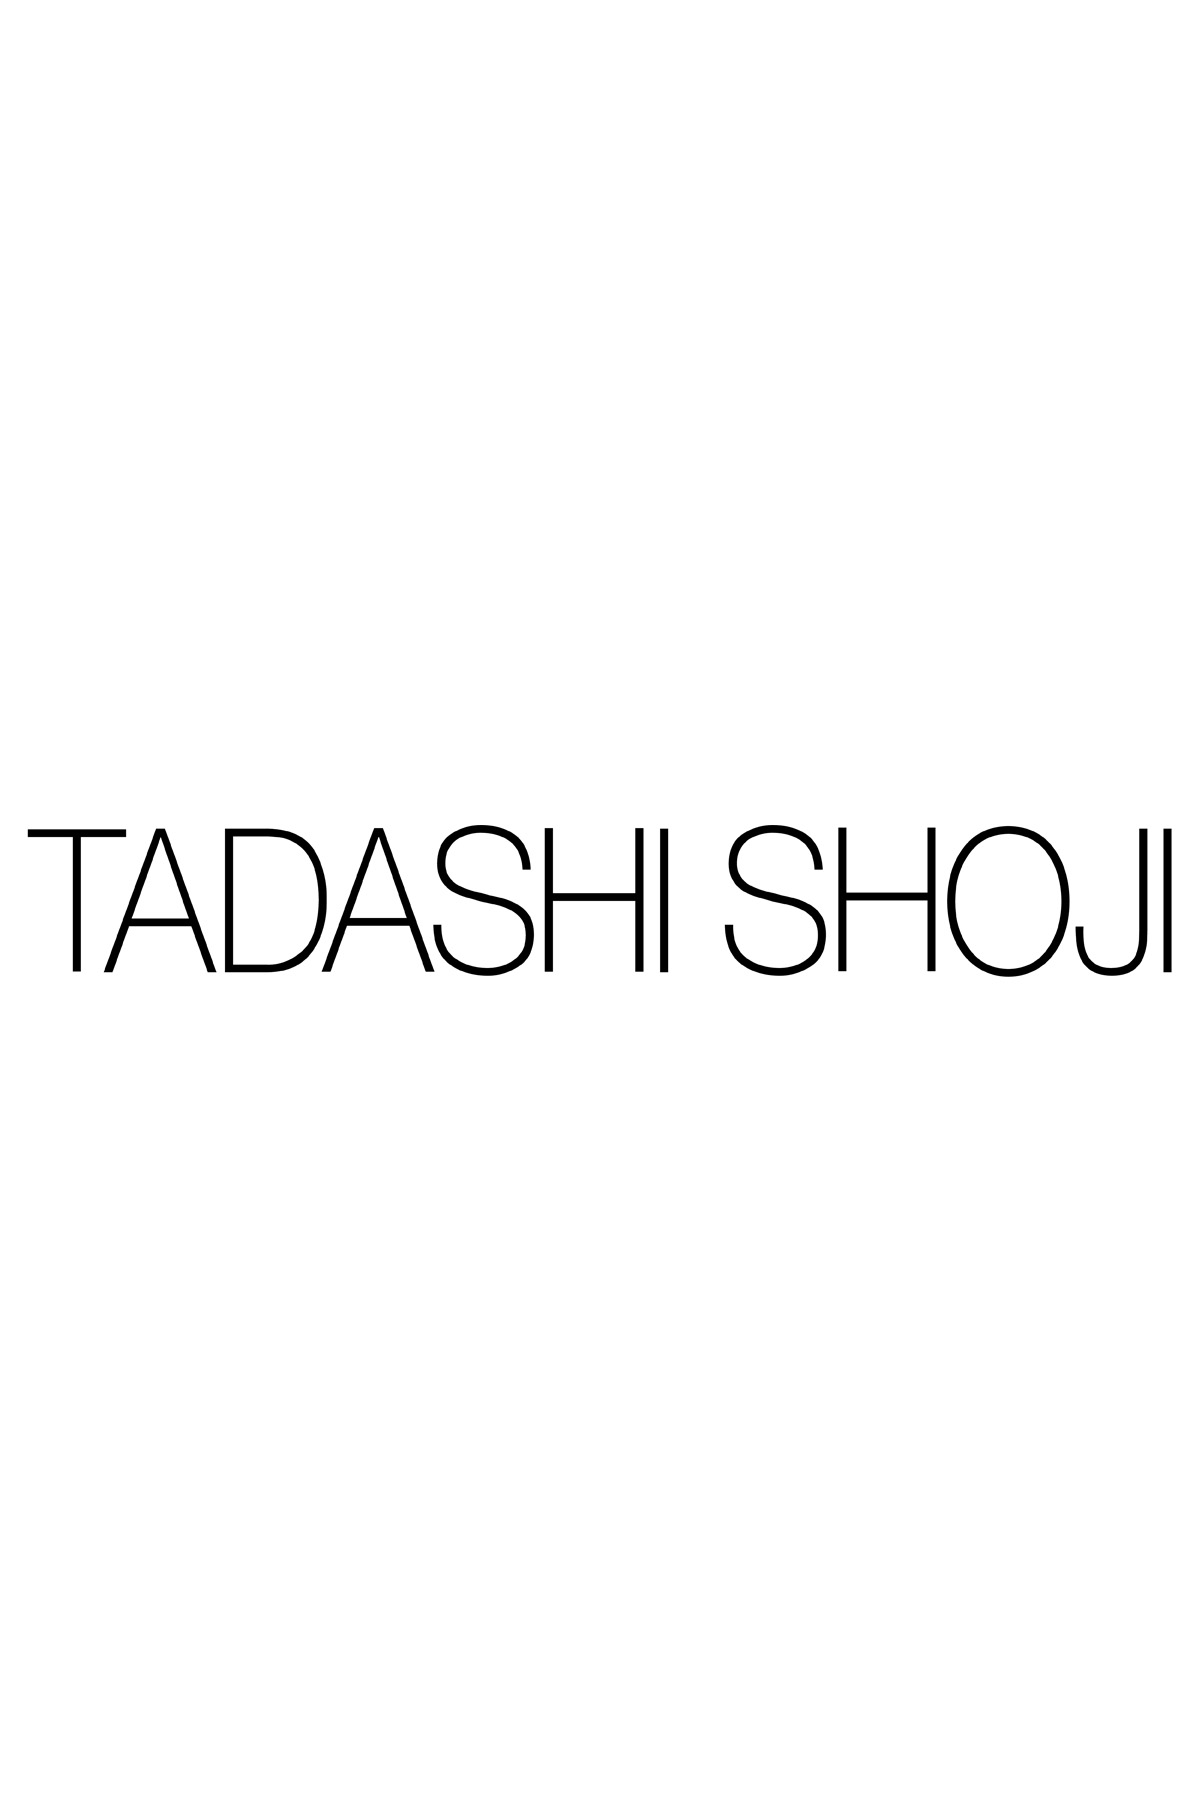 Tadashi Shoji - Liber Floral Headpiece